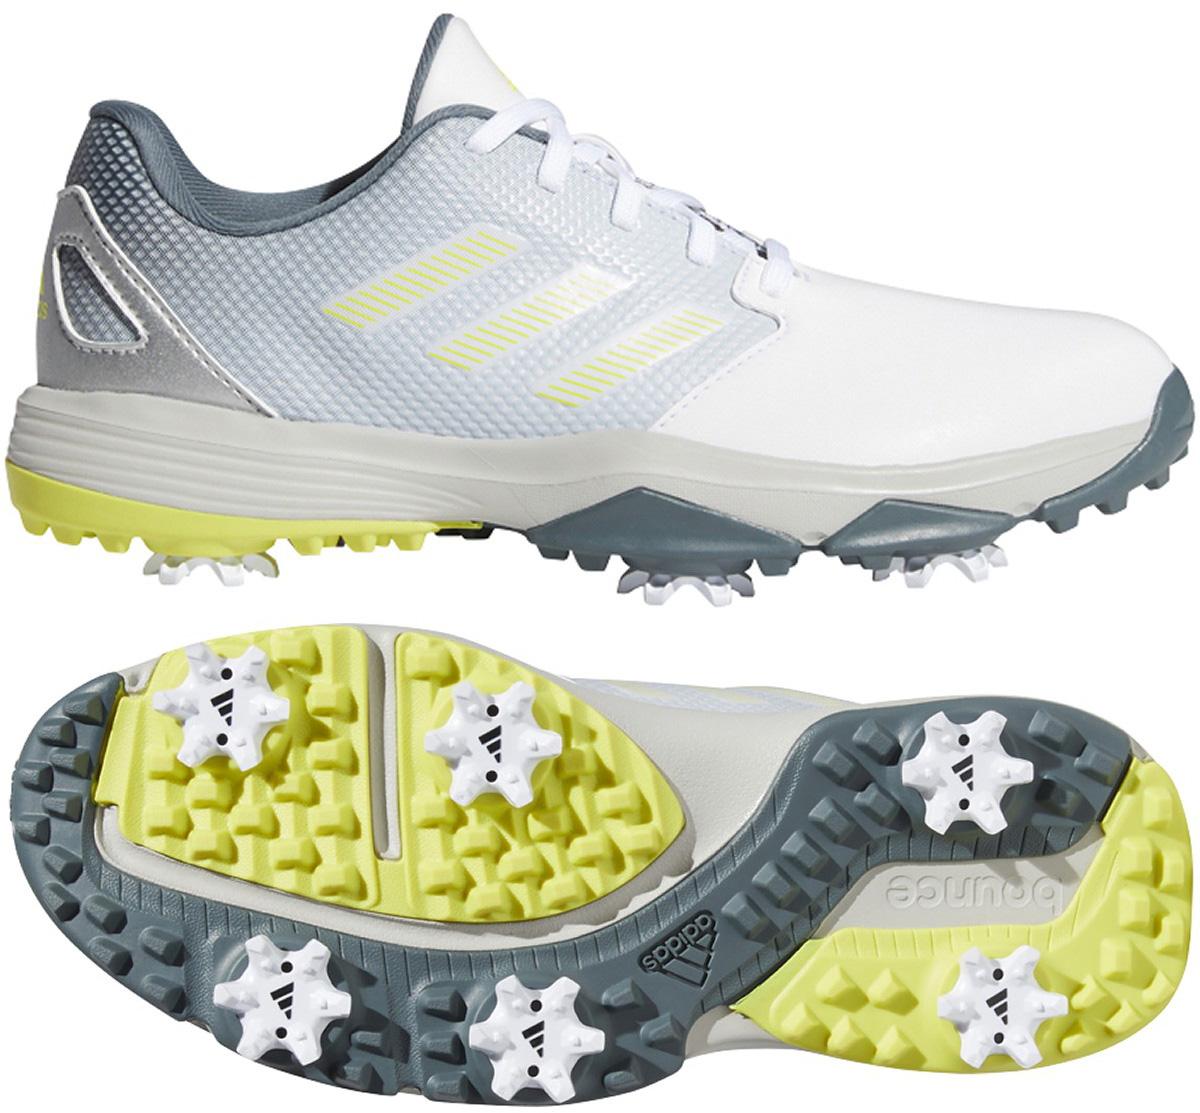 Now @ Golf Locker: Adidas ZG 21 Junior Golf Shoes